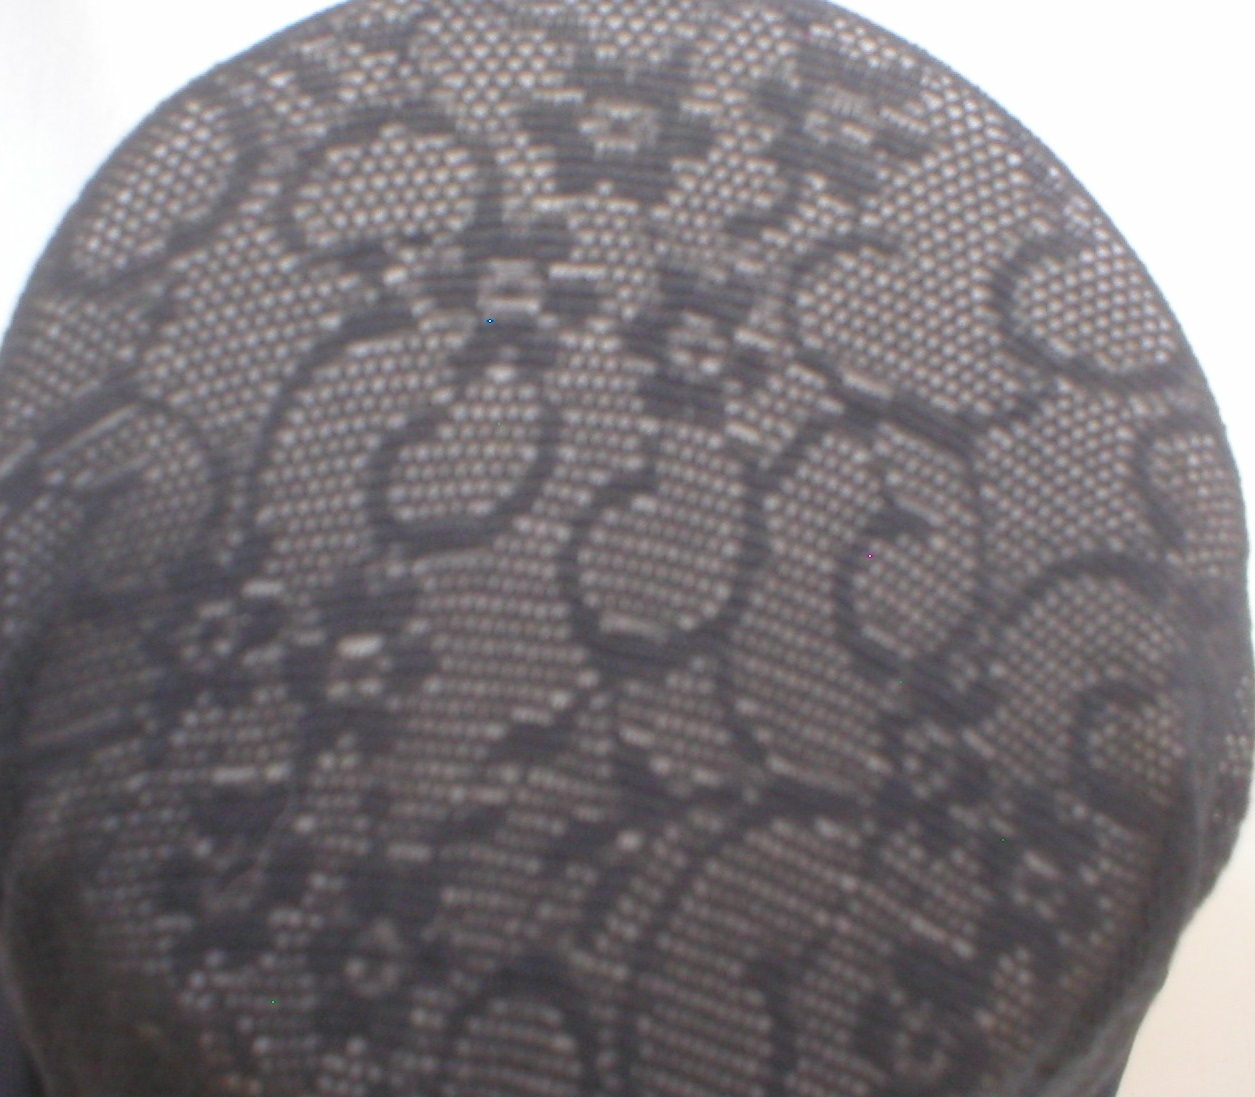 Calvin Klein Black Print  Contol Top Pantyhose 9531 Size D